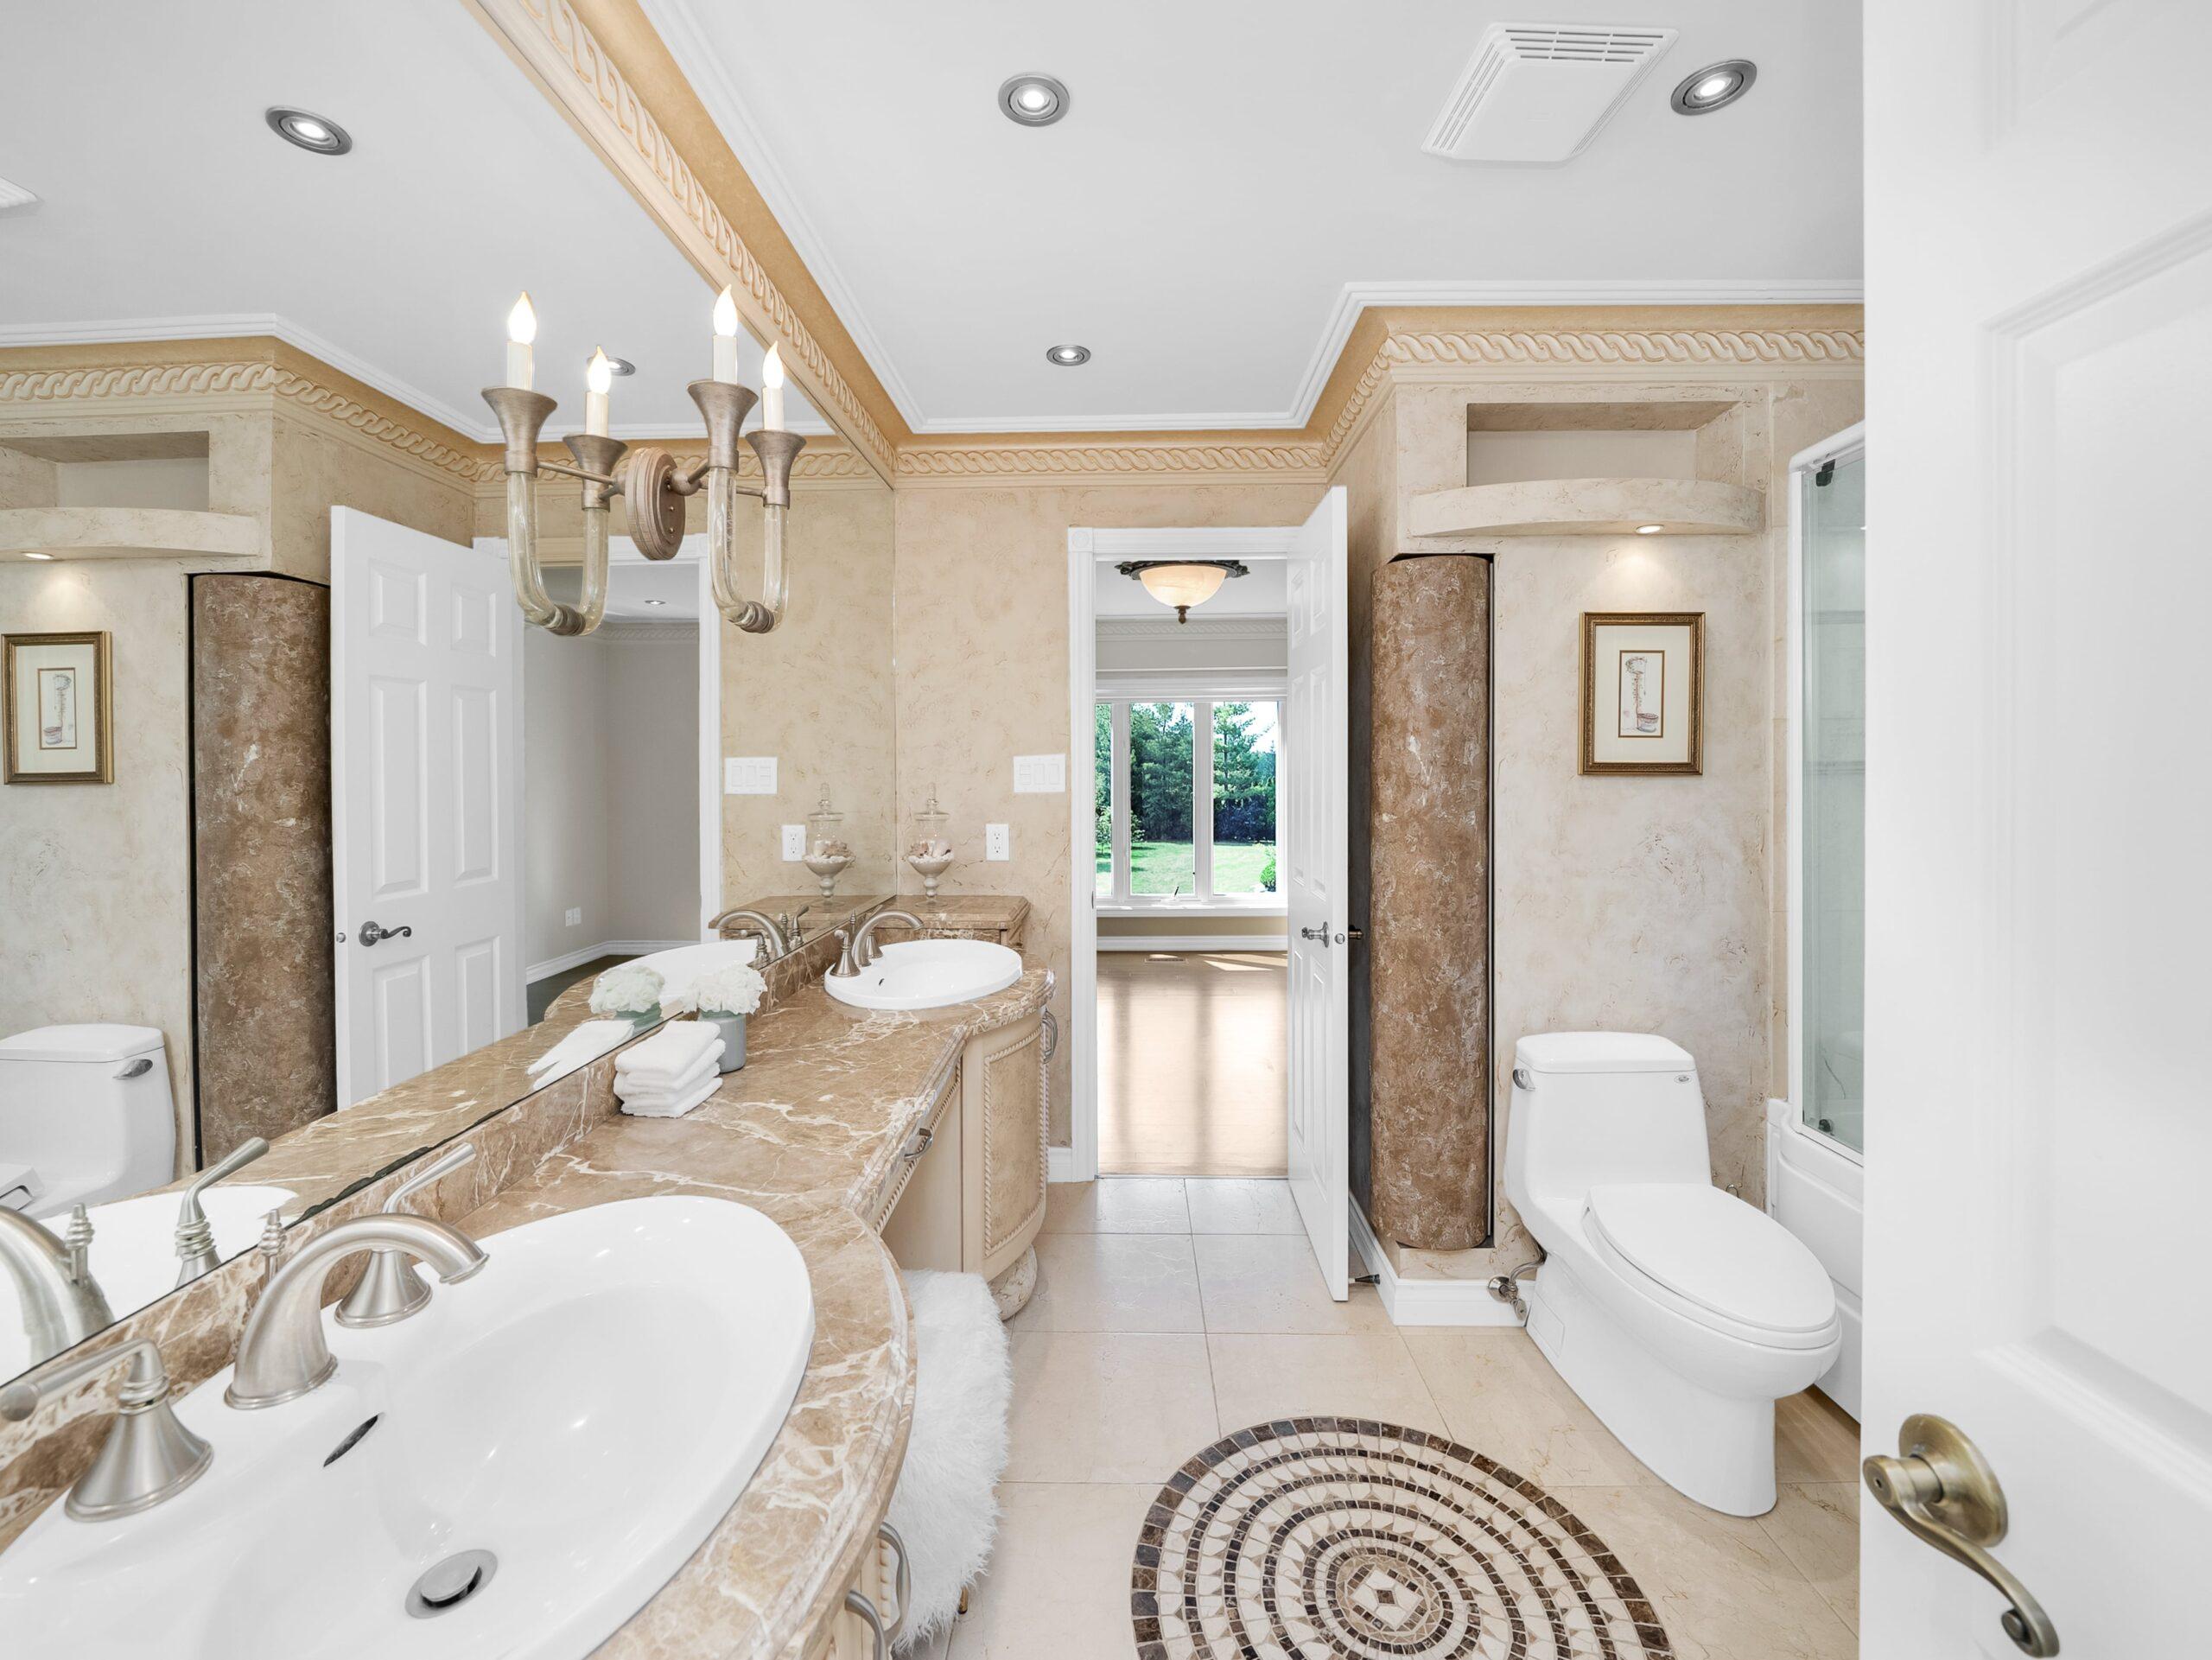 052-Bathroom-4200x3153-min